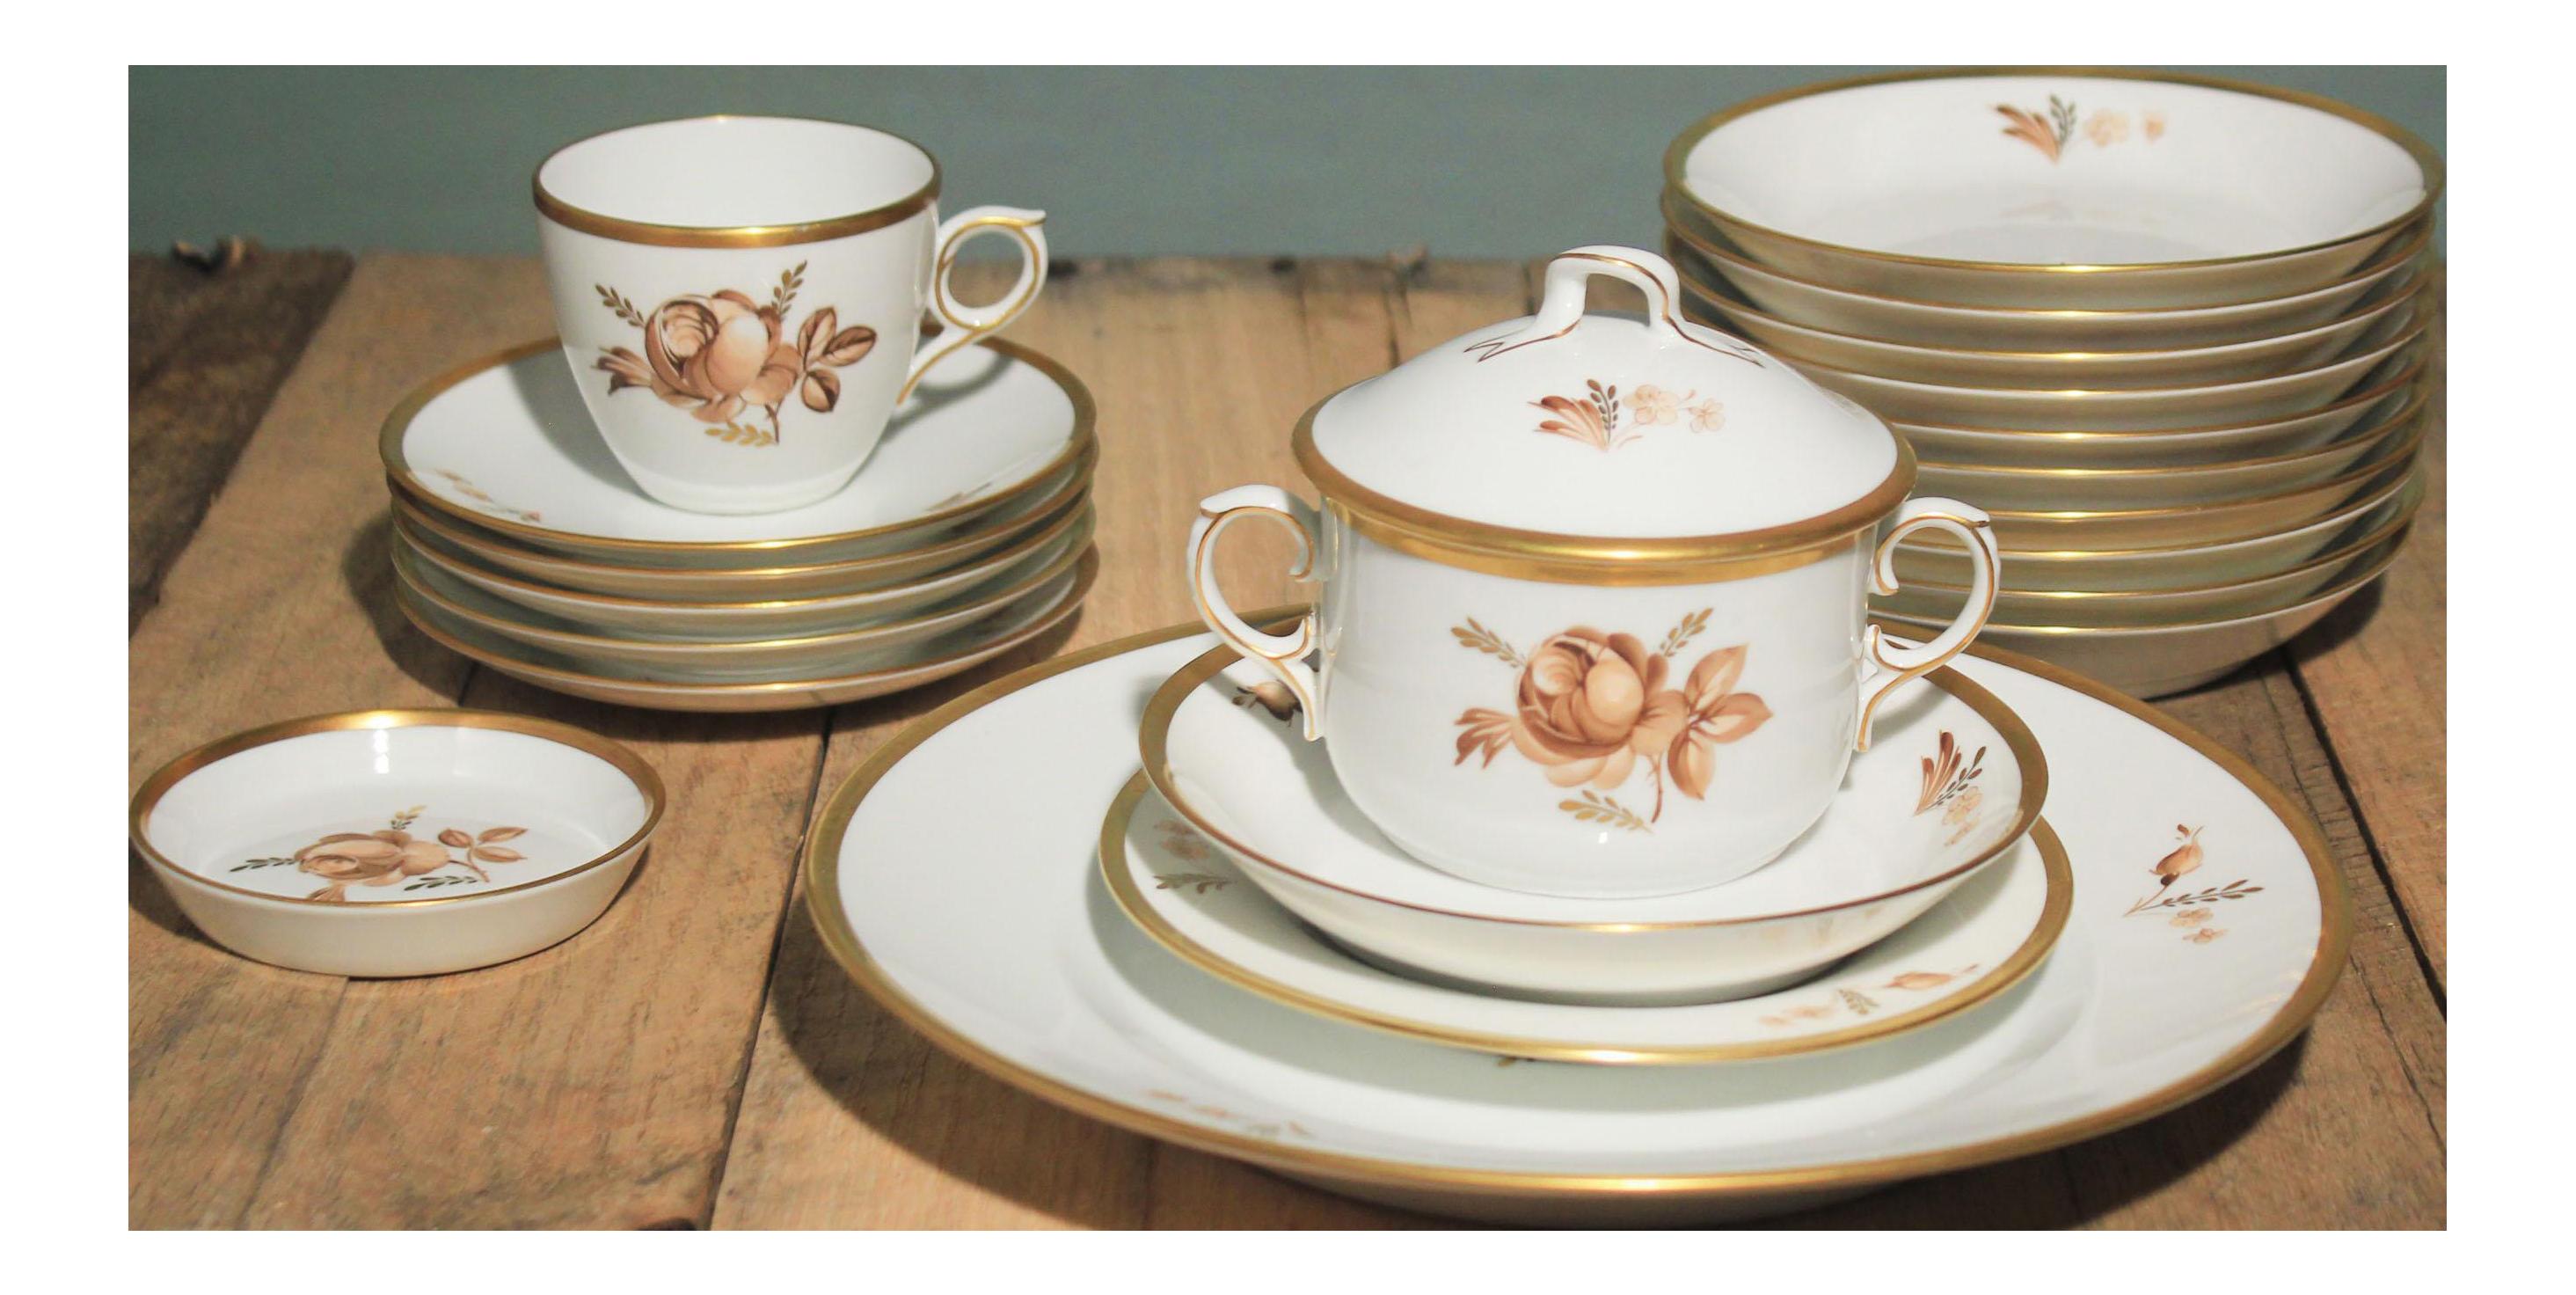 Vintage Royal Copenhagen Porcelain Rose u0026 Gold Dinnerware  sc 1 st  Chairish & Vintage Royal Copenhagen Porcelain Rose u0026 Gold Dinnerware | Chairish